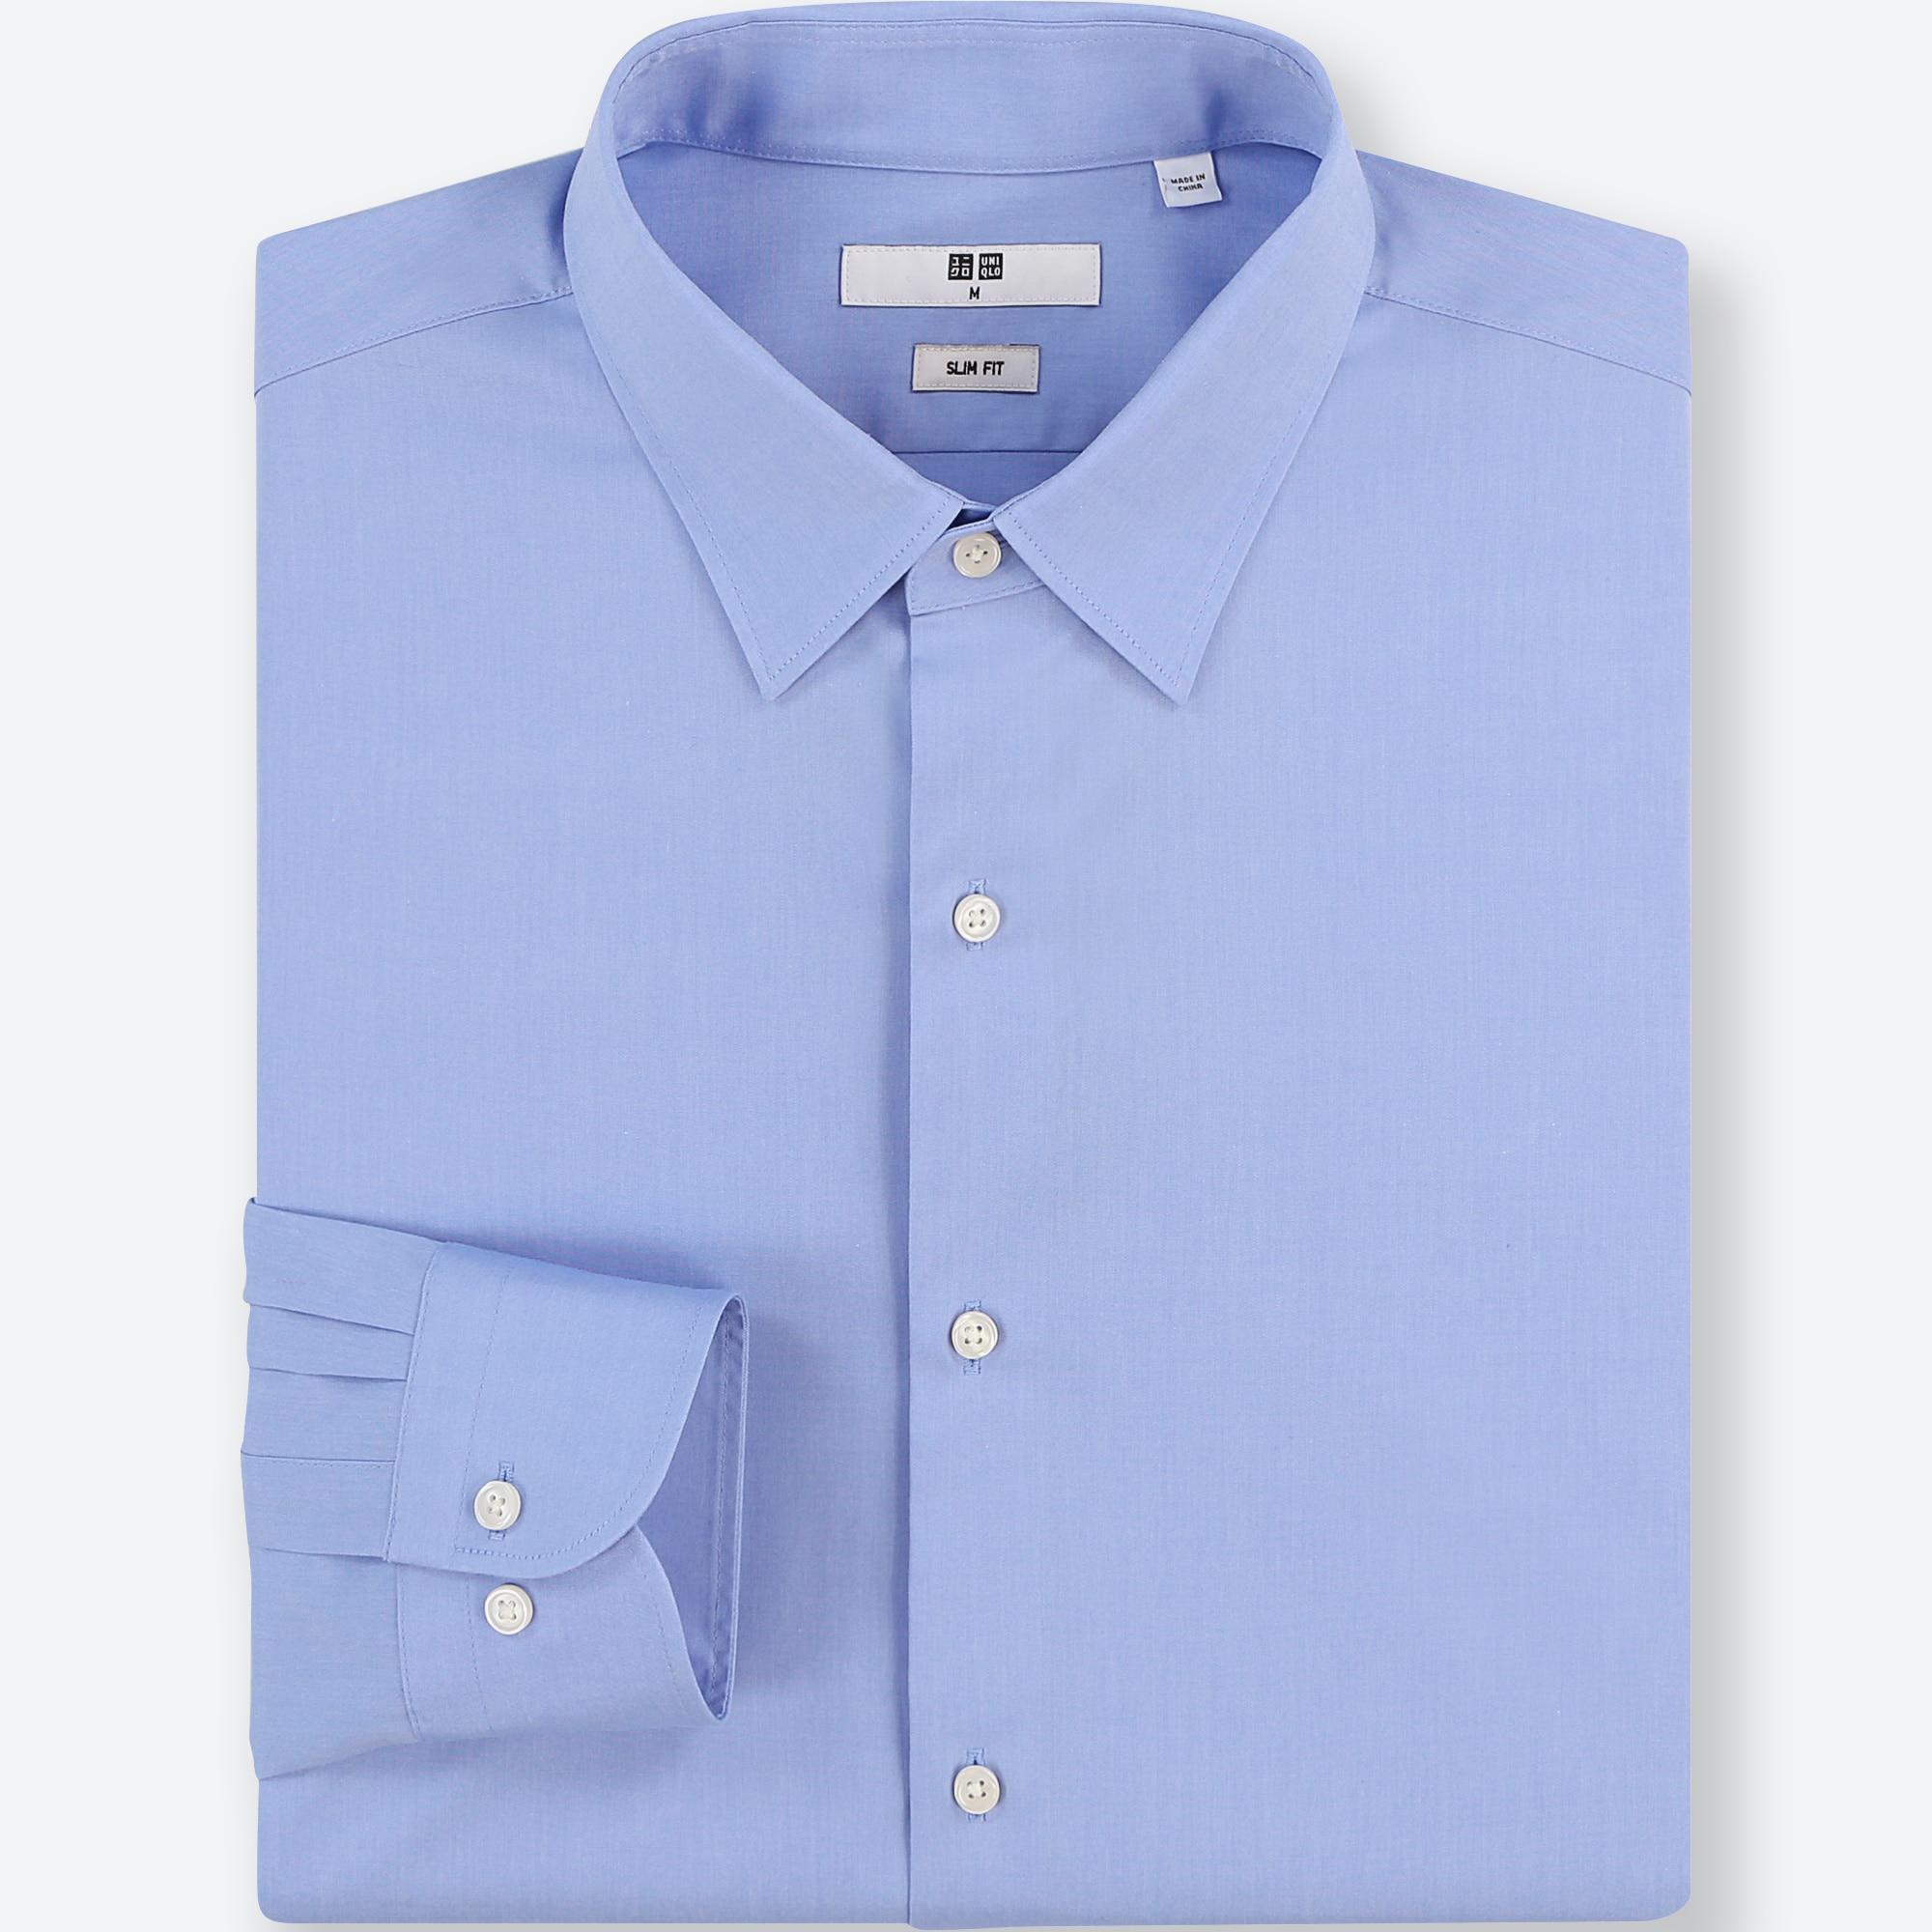 UK SIZE 6-8 10-12 CHINESE-DRAGON LONG DRESS 4 colours uk quality stock